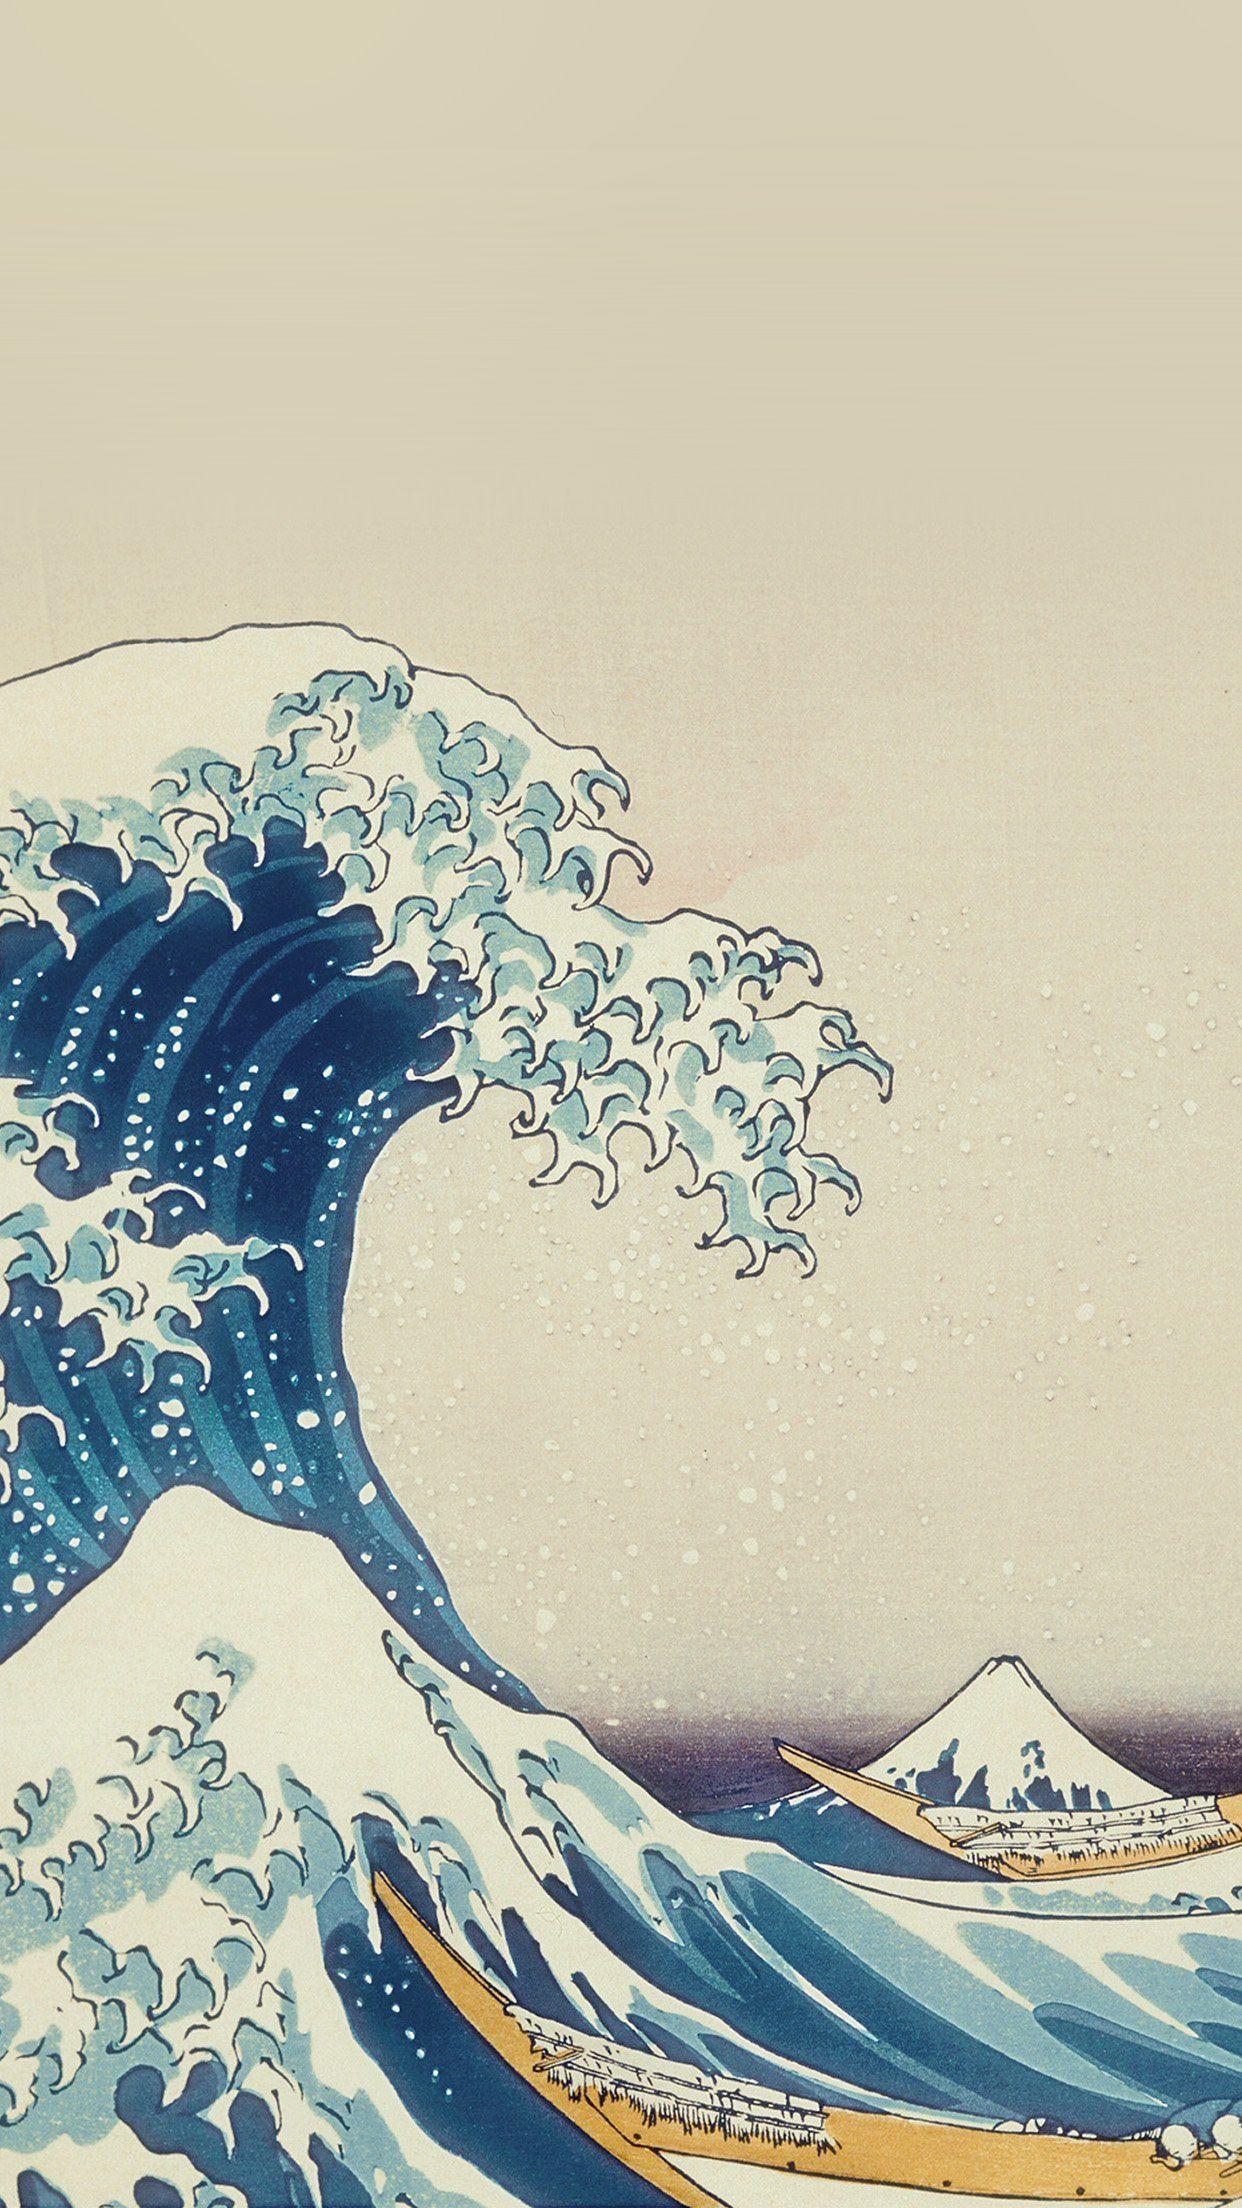 cool wave art hokusai painting classic artillustration